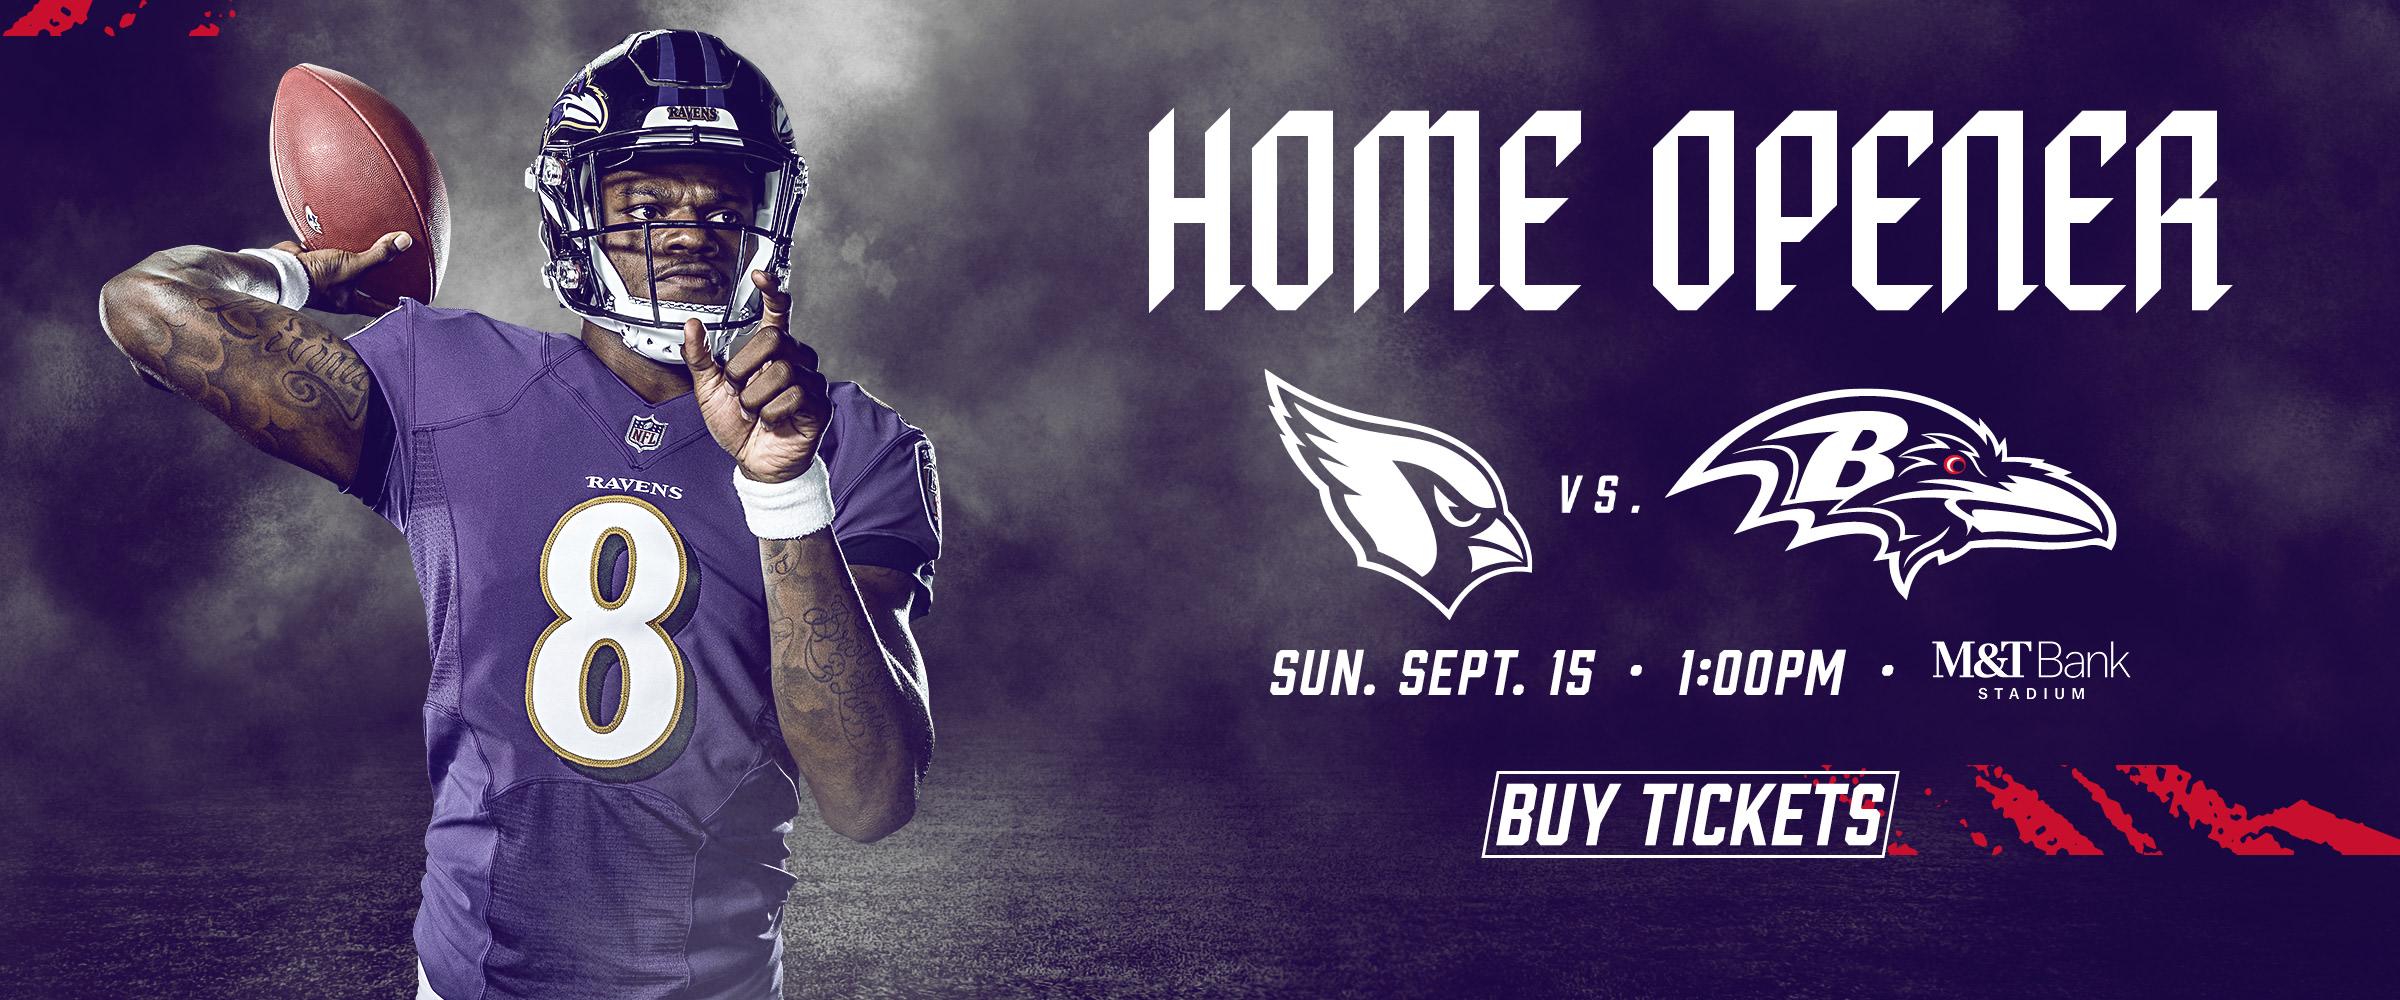 572eb4a7 Ravens Tickets | Baltimore Ravens – baltimoreravens.com